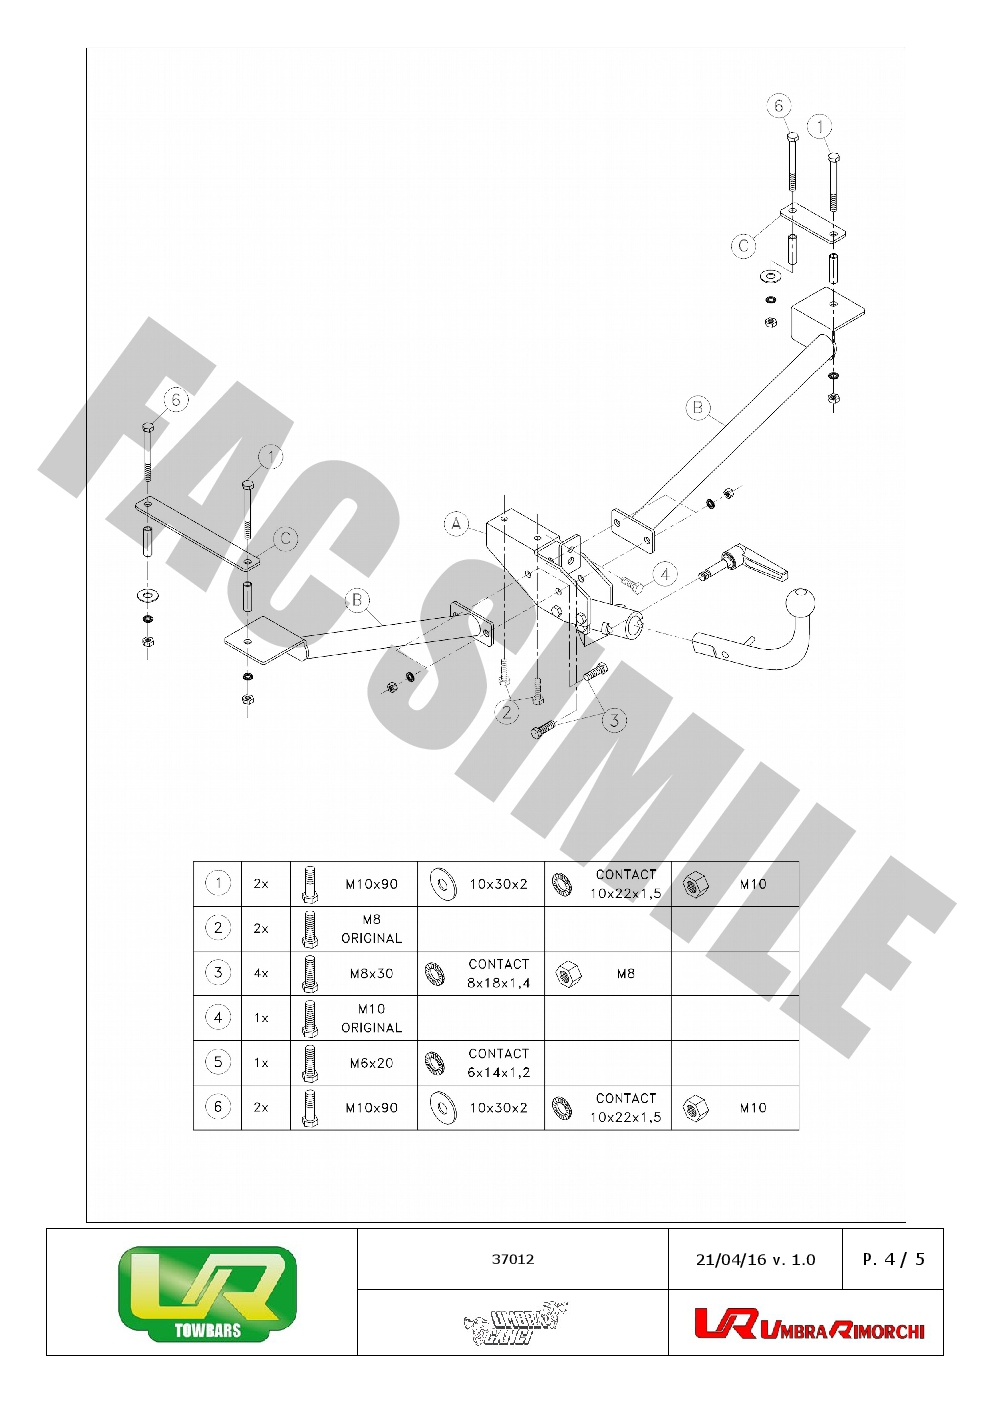 Detach Towbar 7p Bypass Relay For Suzuki Wagon R 4seats Mpv 00 02 Engine Diagram Tripleboo Market